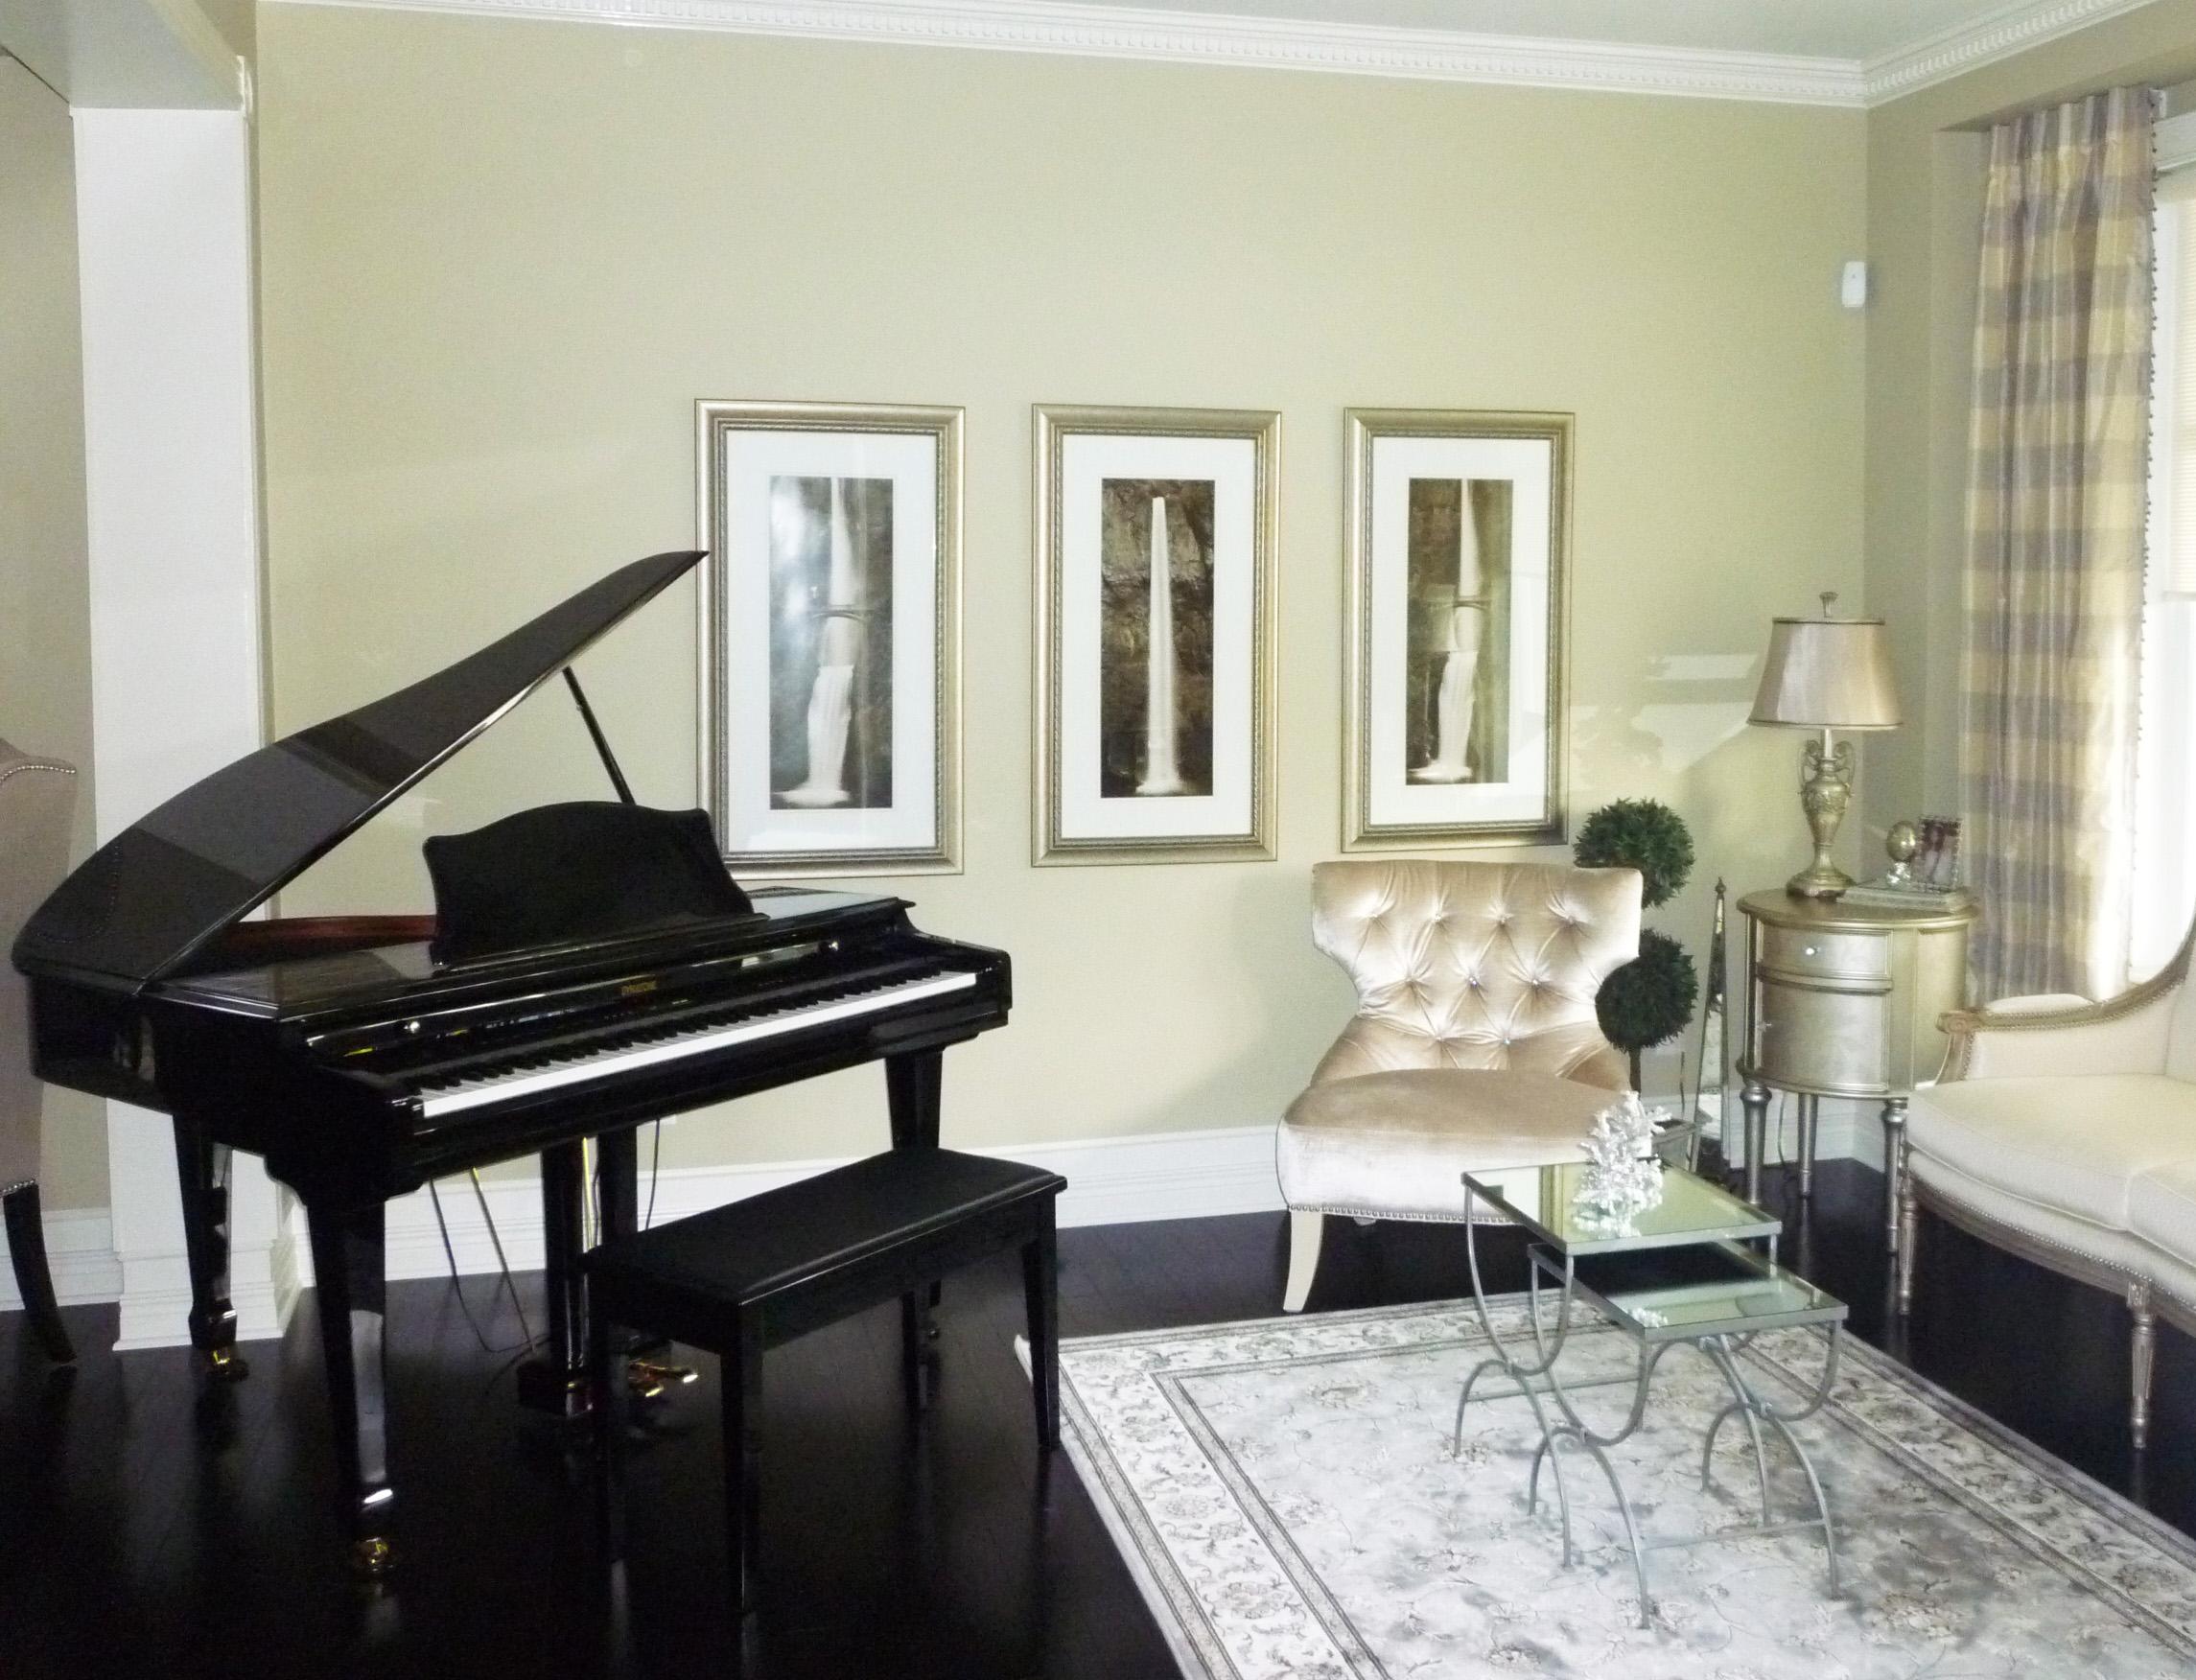 Residential Home Design - Music Room